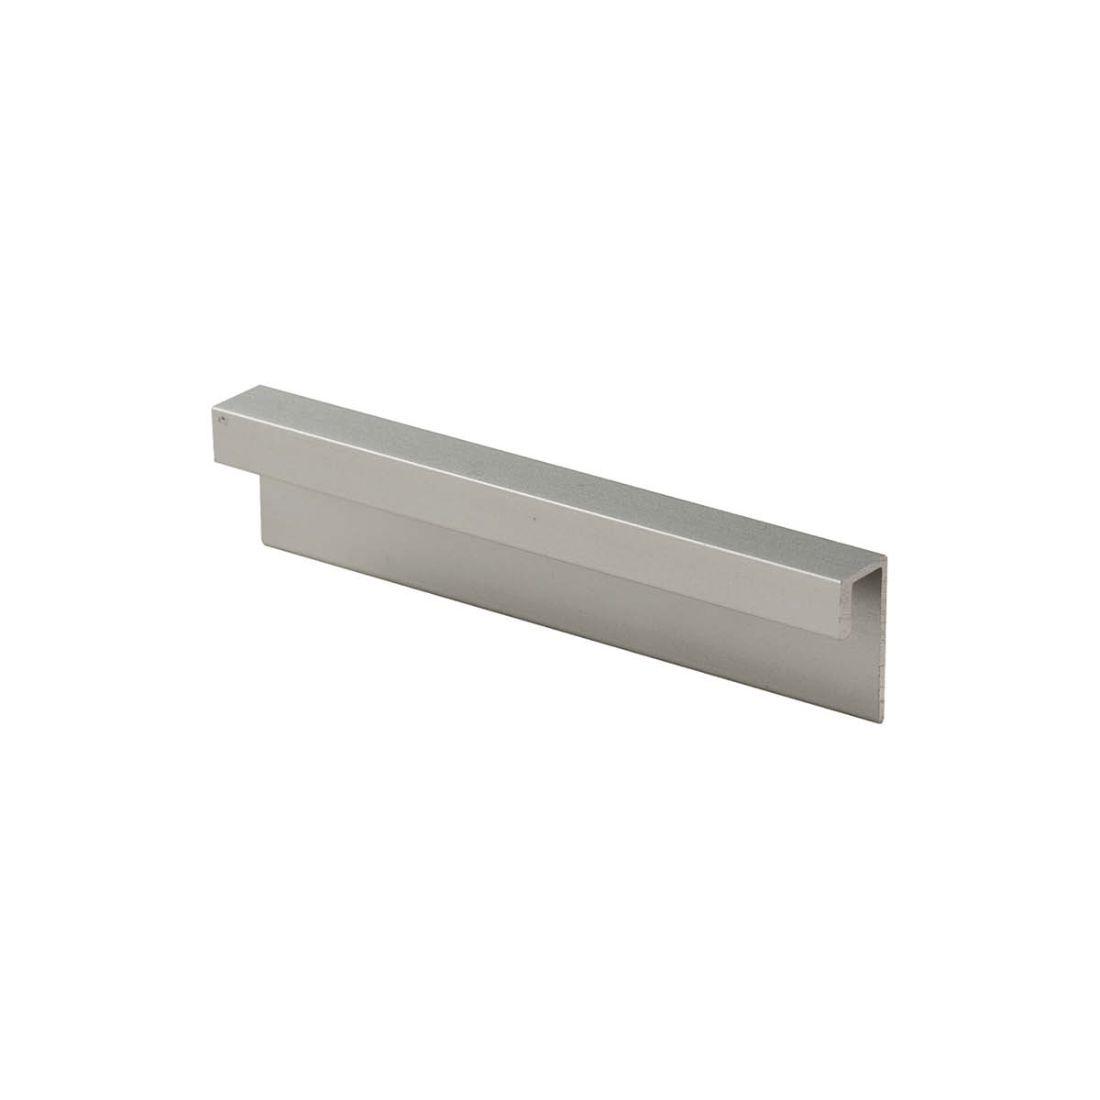 Aluminium End Cap Noir Kiss 2700 x 4.5mm